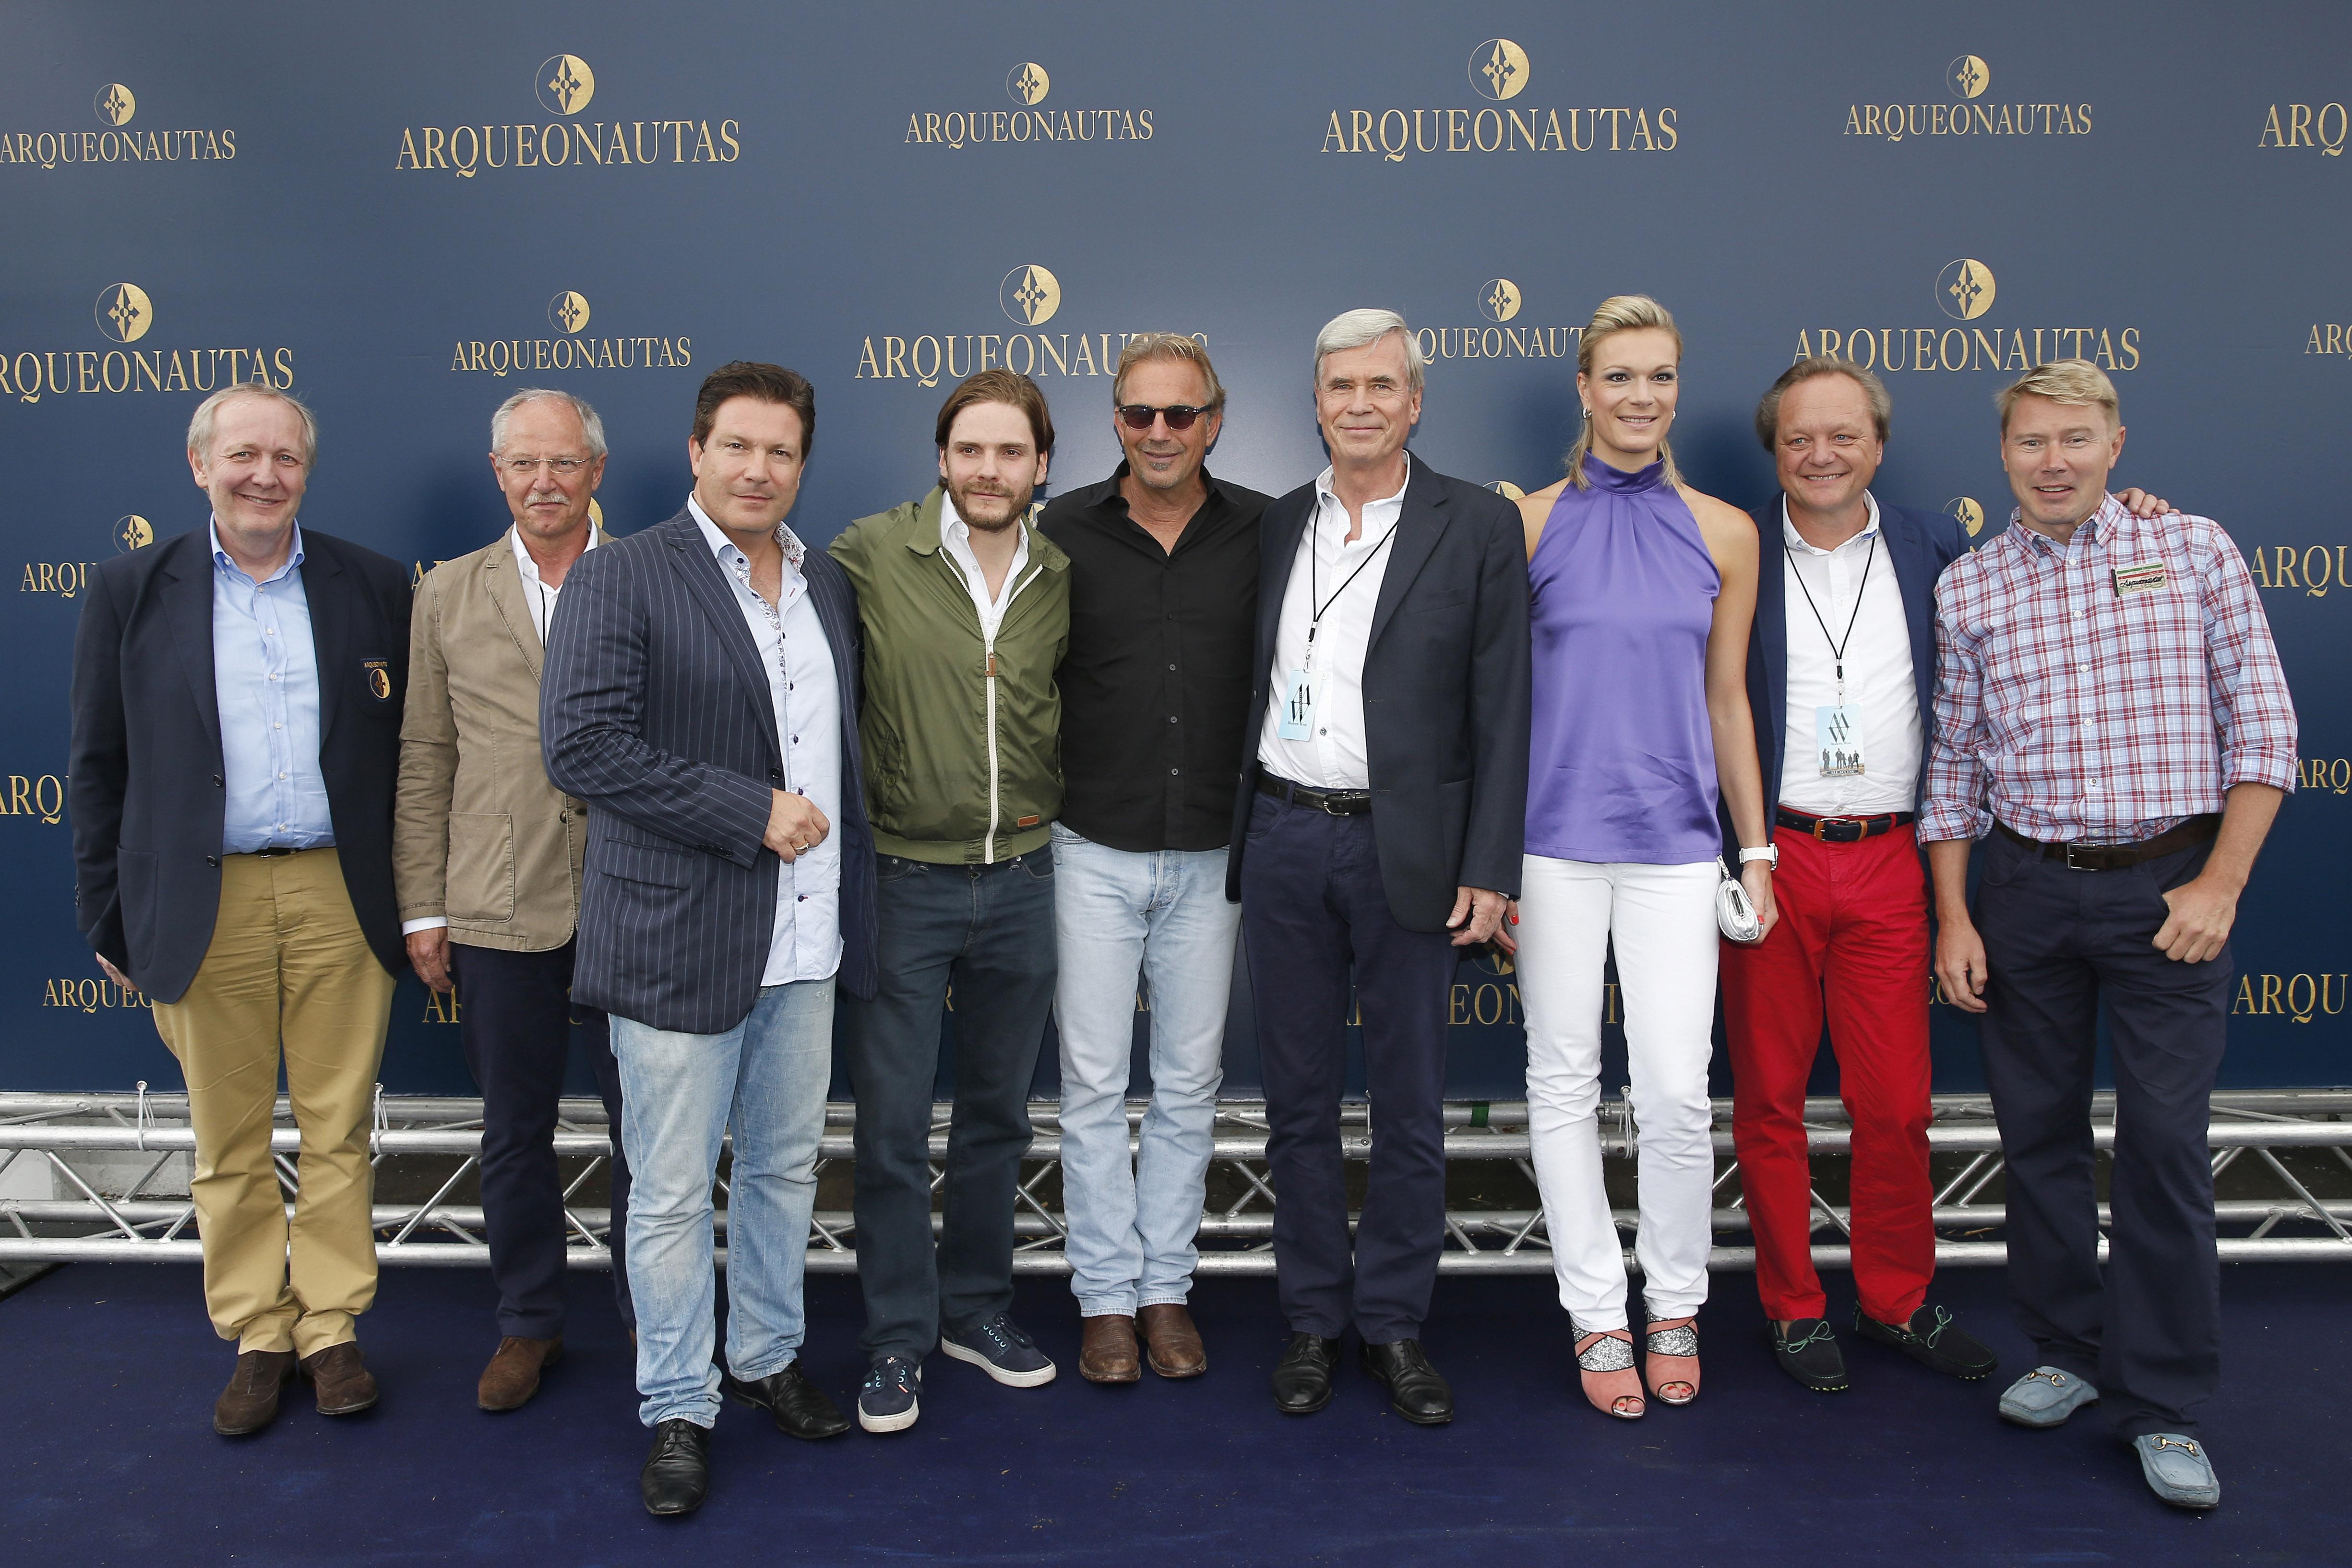 Arqueonautas Presents Kevin Costner - Music Meets Fashion